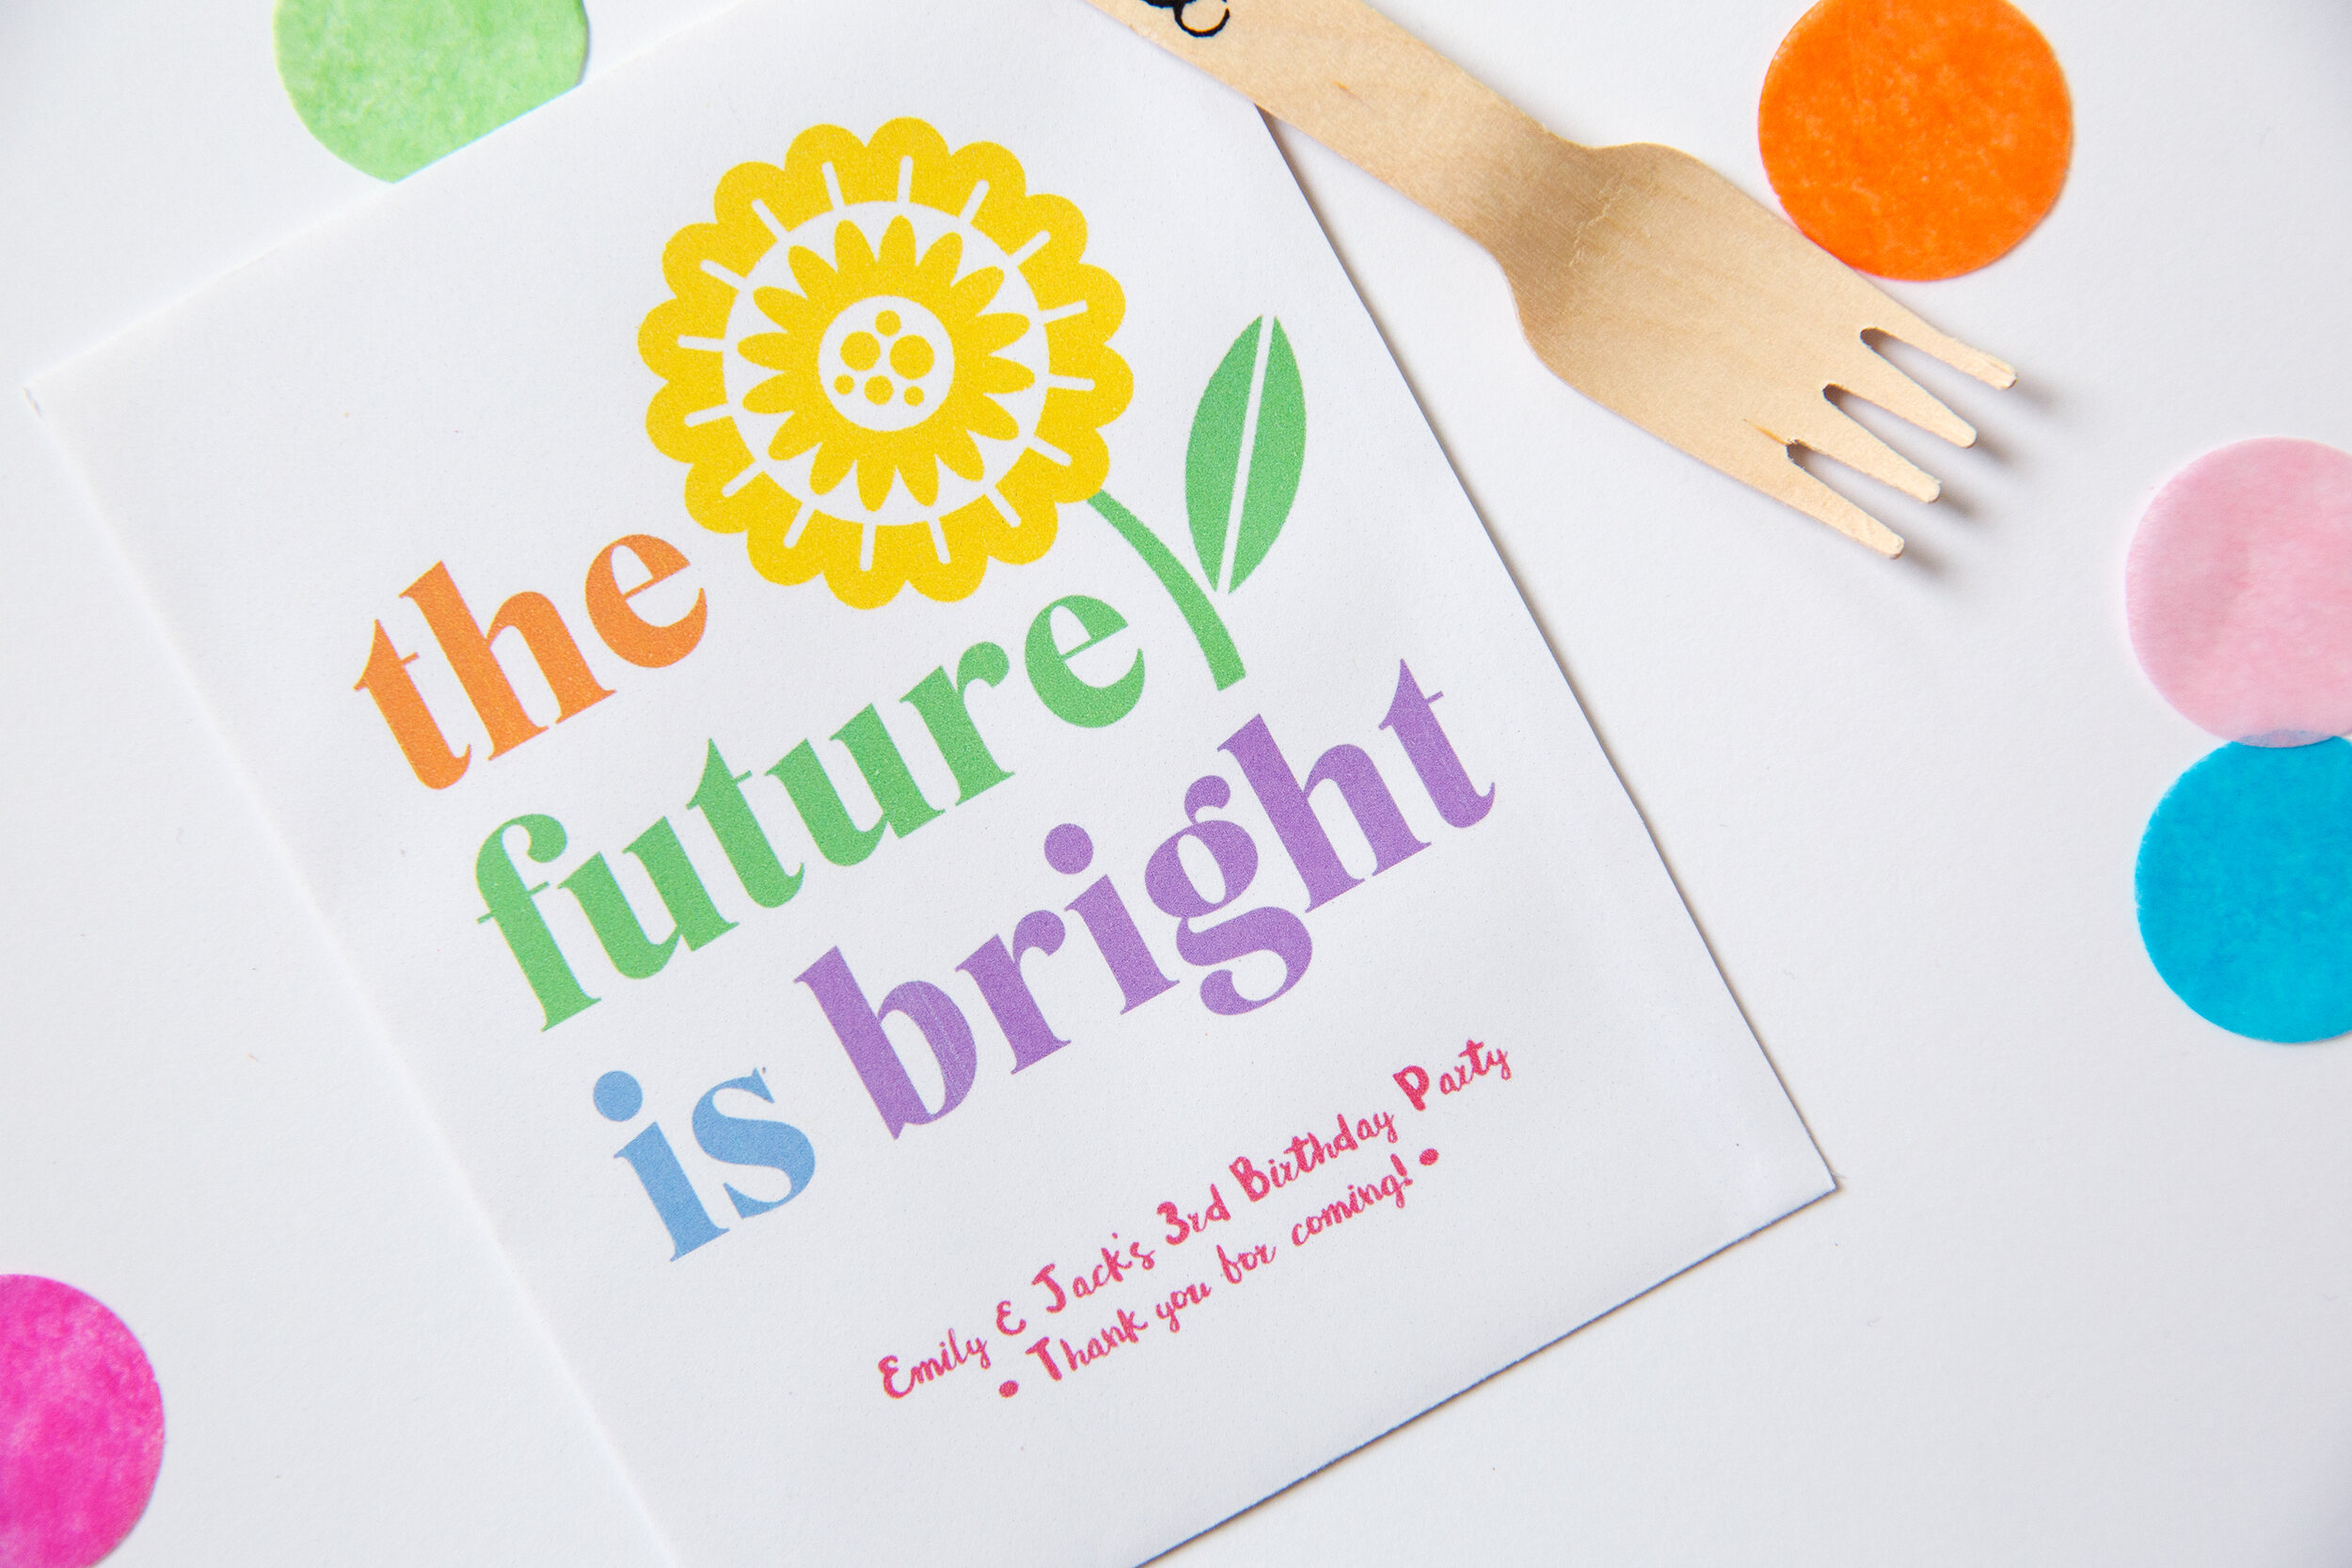 Birthday - The future is bright 3.jpg